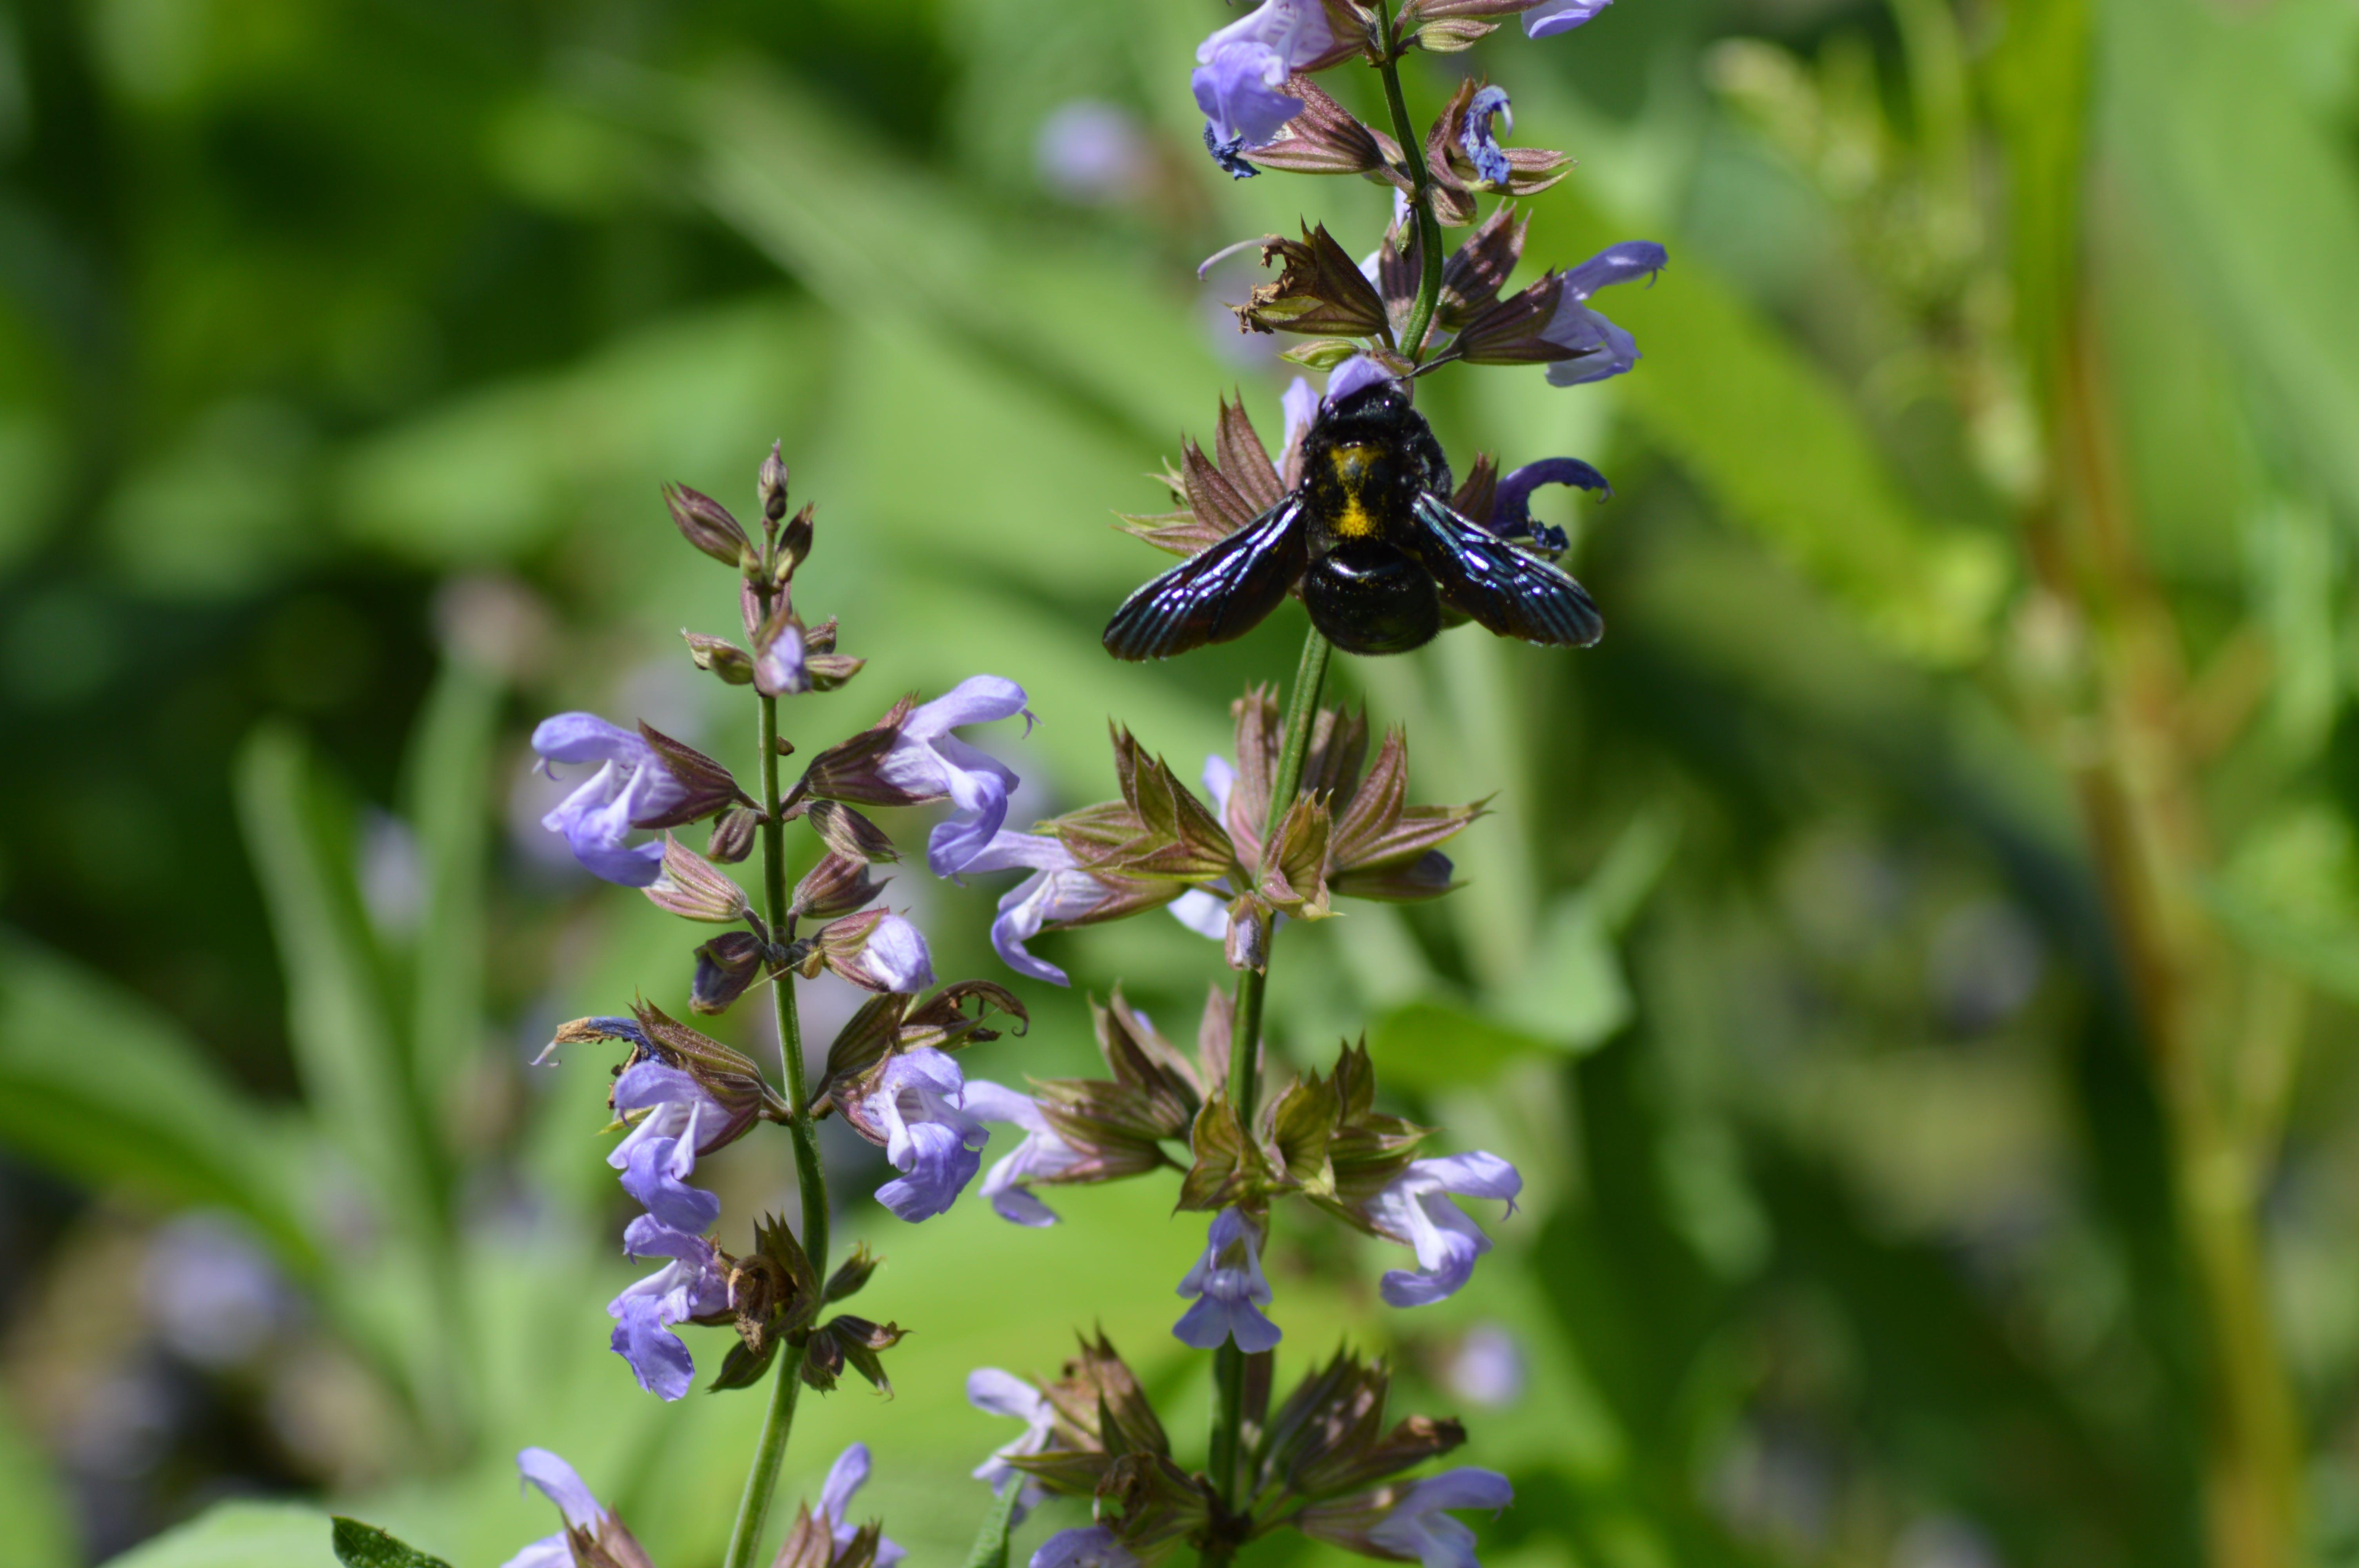 Free stock photo of bee, environment, flowers, greenery